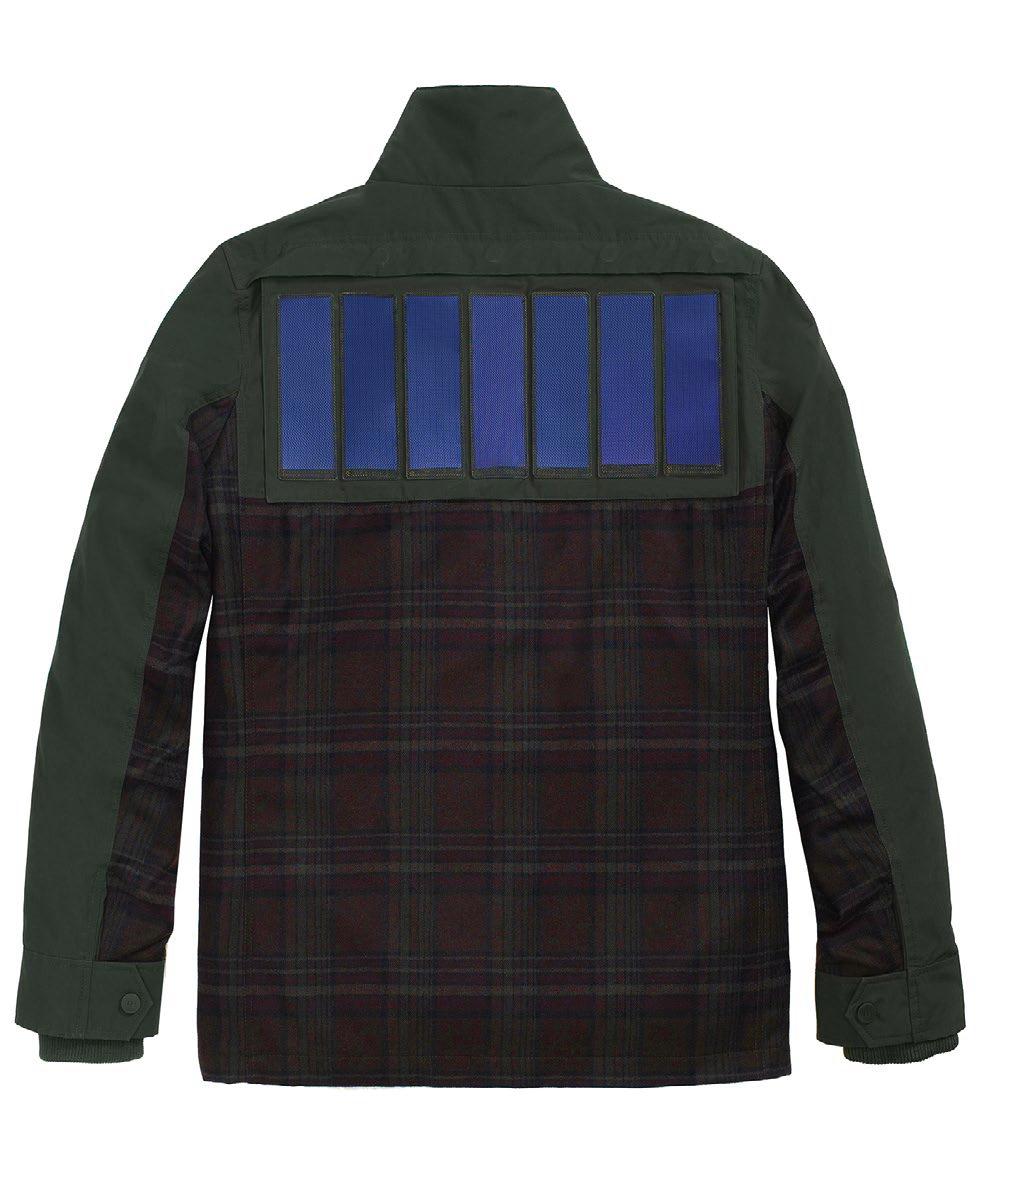 solar_m_back